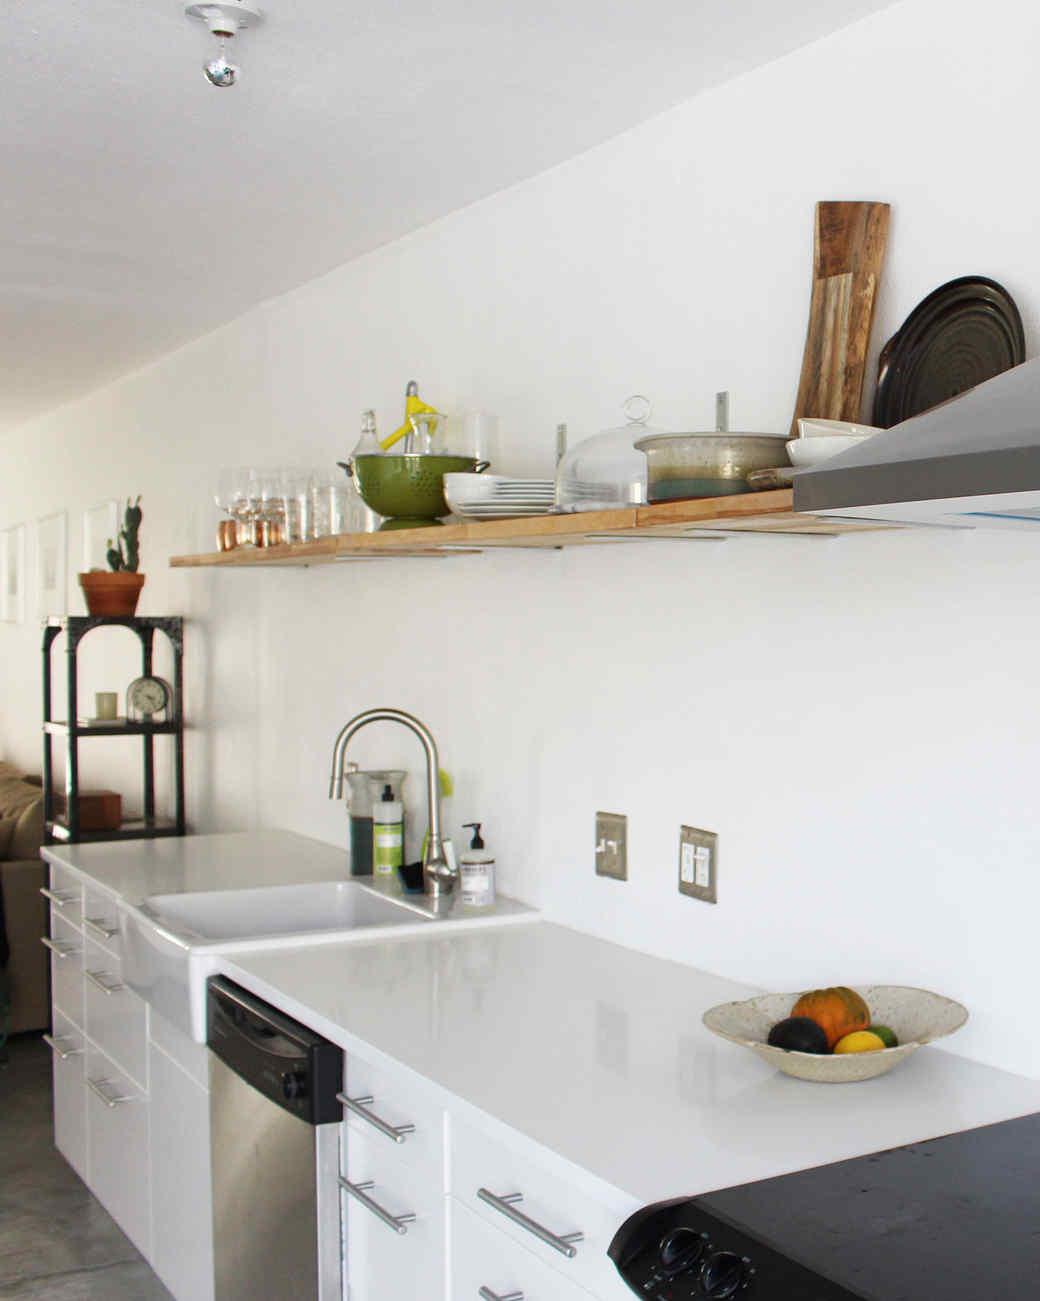 4-kitchen-after-close-up.jpg